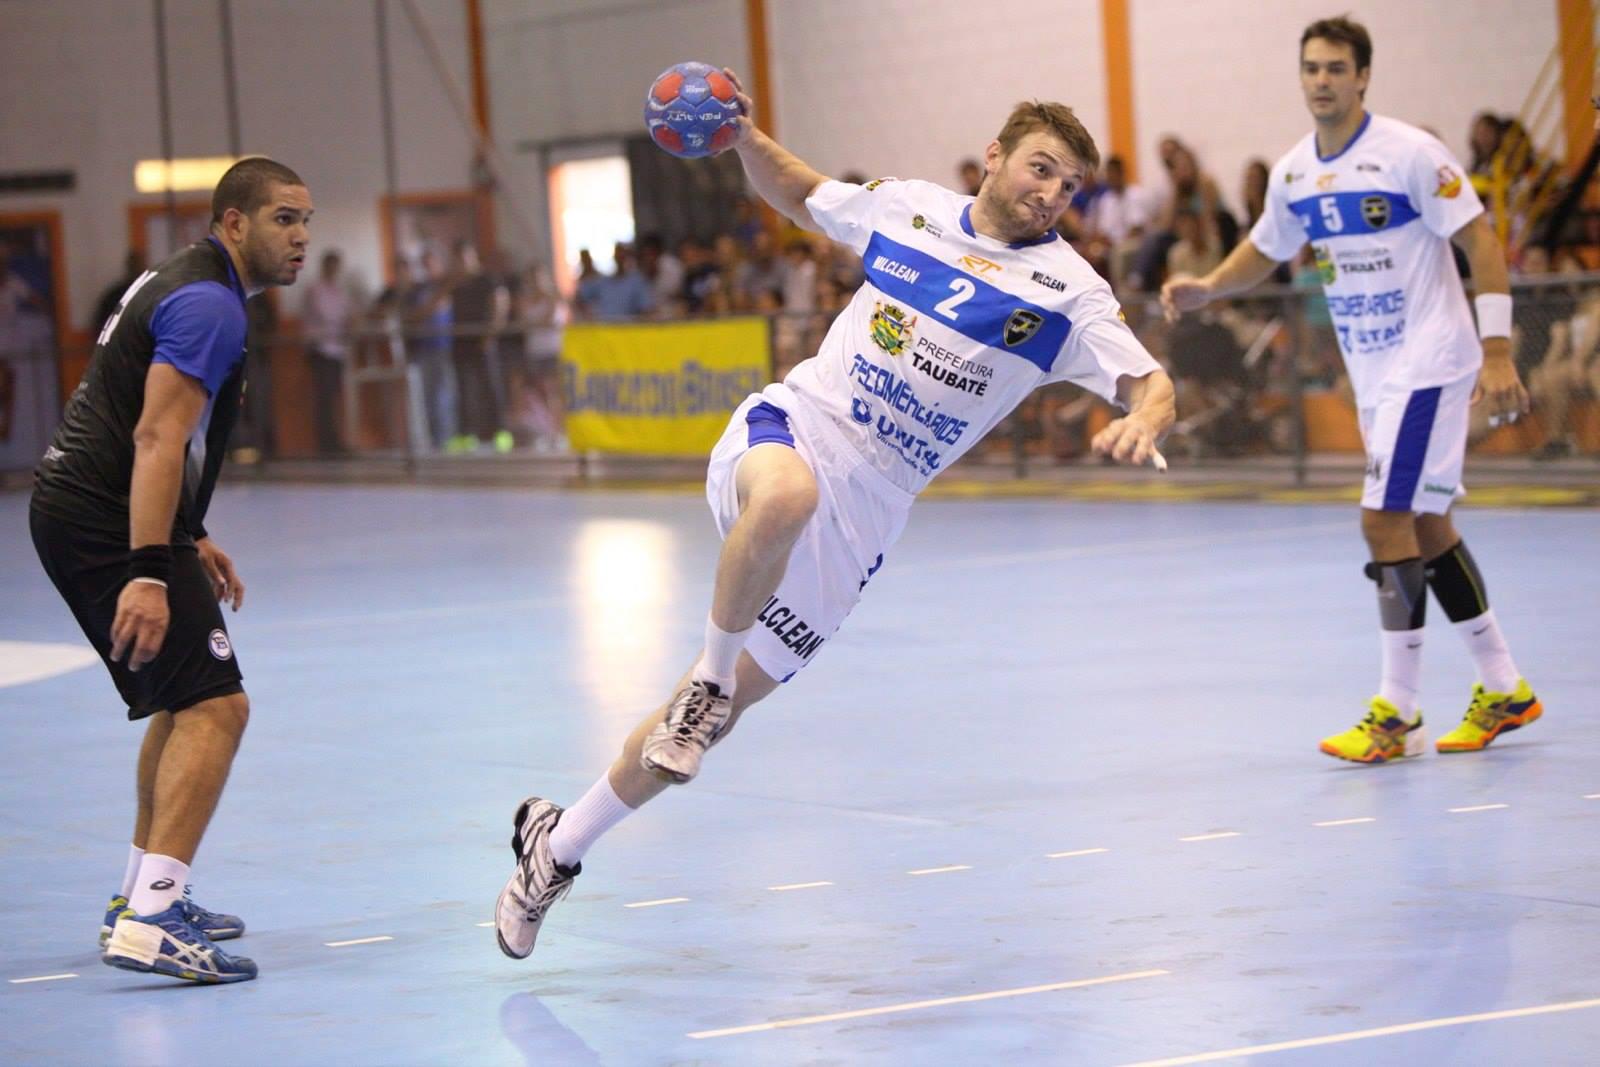 2404_Aparecida sedia a fase final da Liga Nacional Masculina de Handebol.esporte.04-12-2014